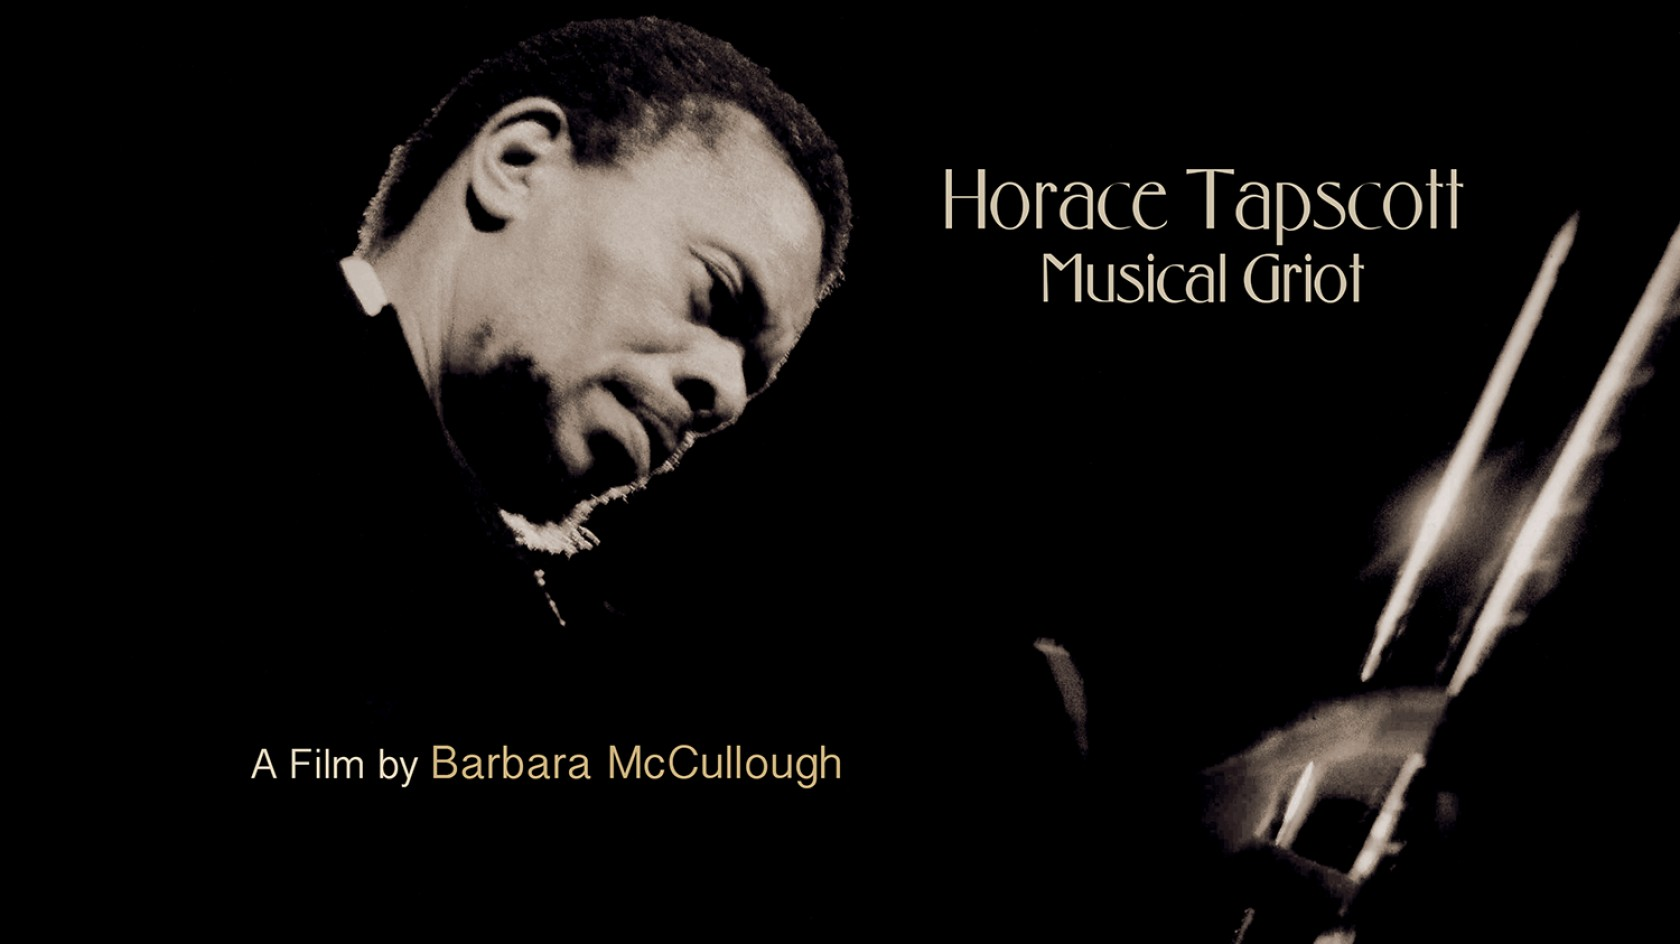  Barbara McCullough, HORACE TAPSCOTT: MUSICAL GRIOT